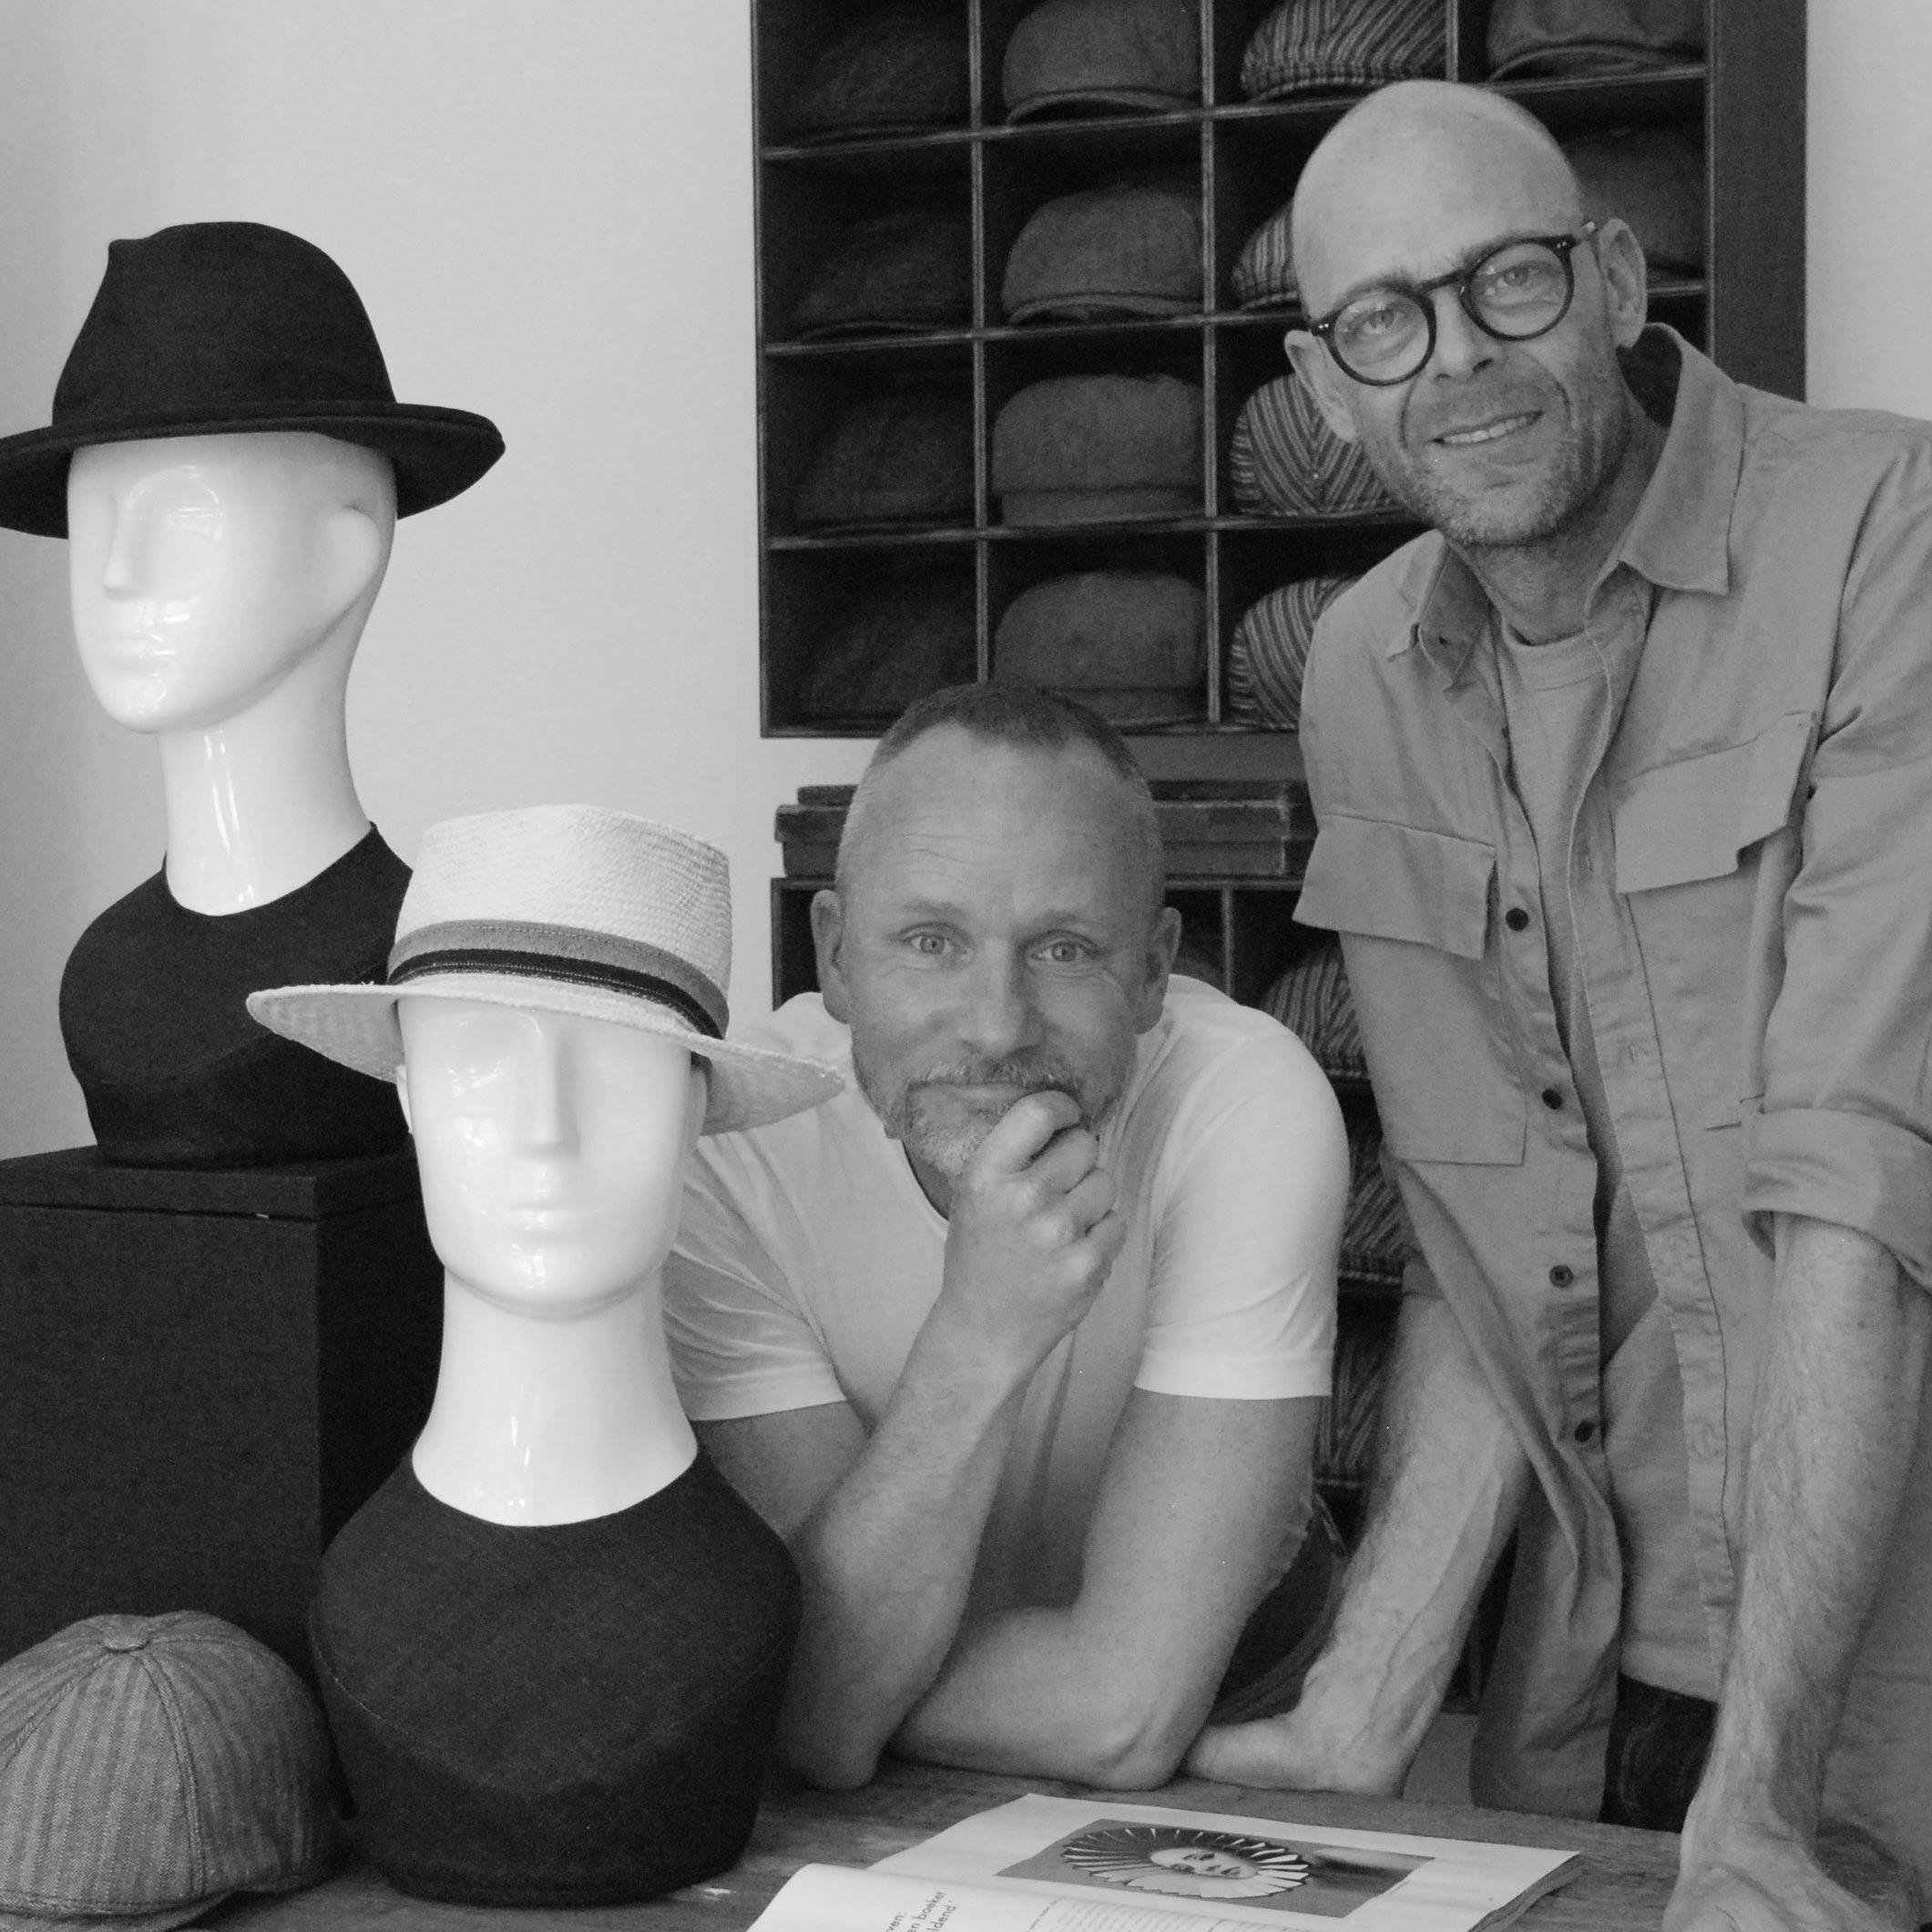 Ow-our-world-magazine-De-Hoedenmaker-atelier-winkel-ambacht